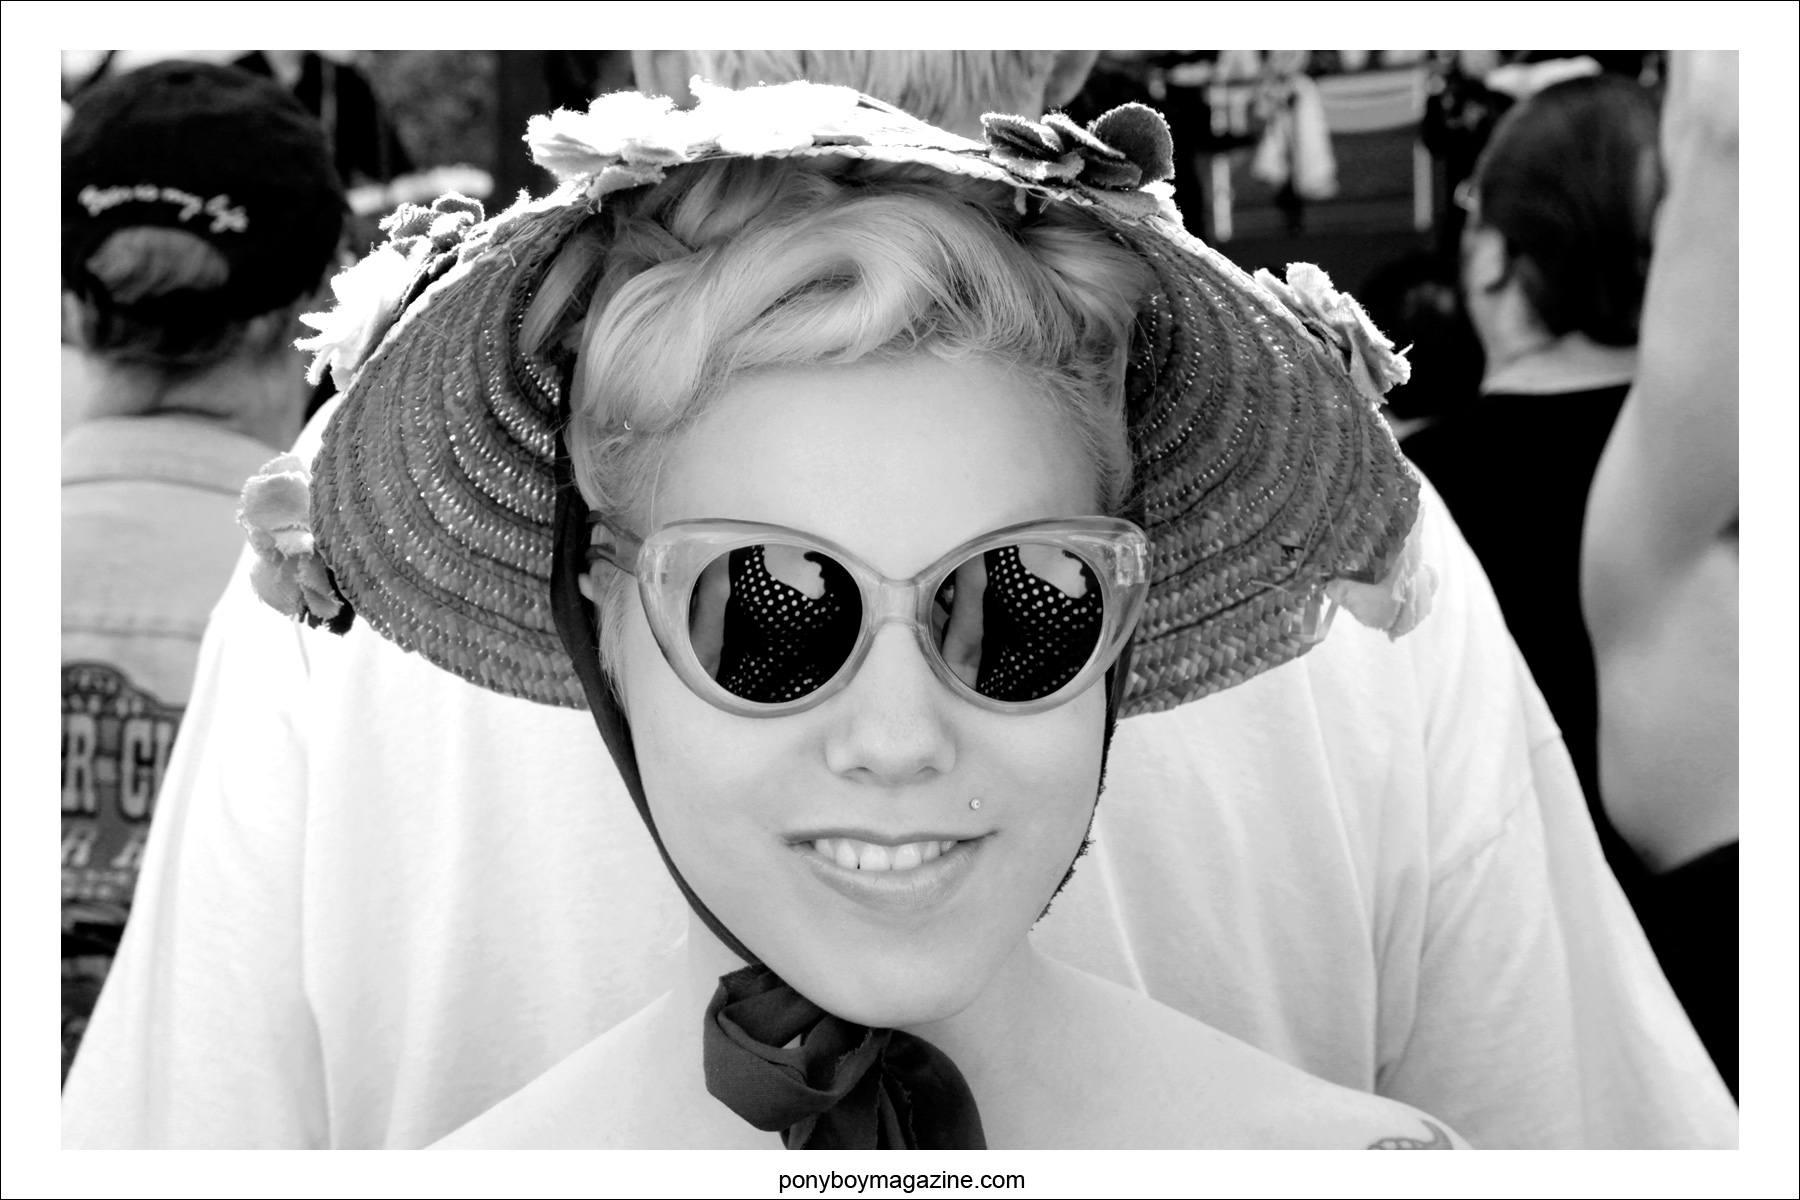 A 1950's vintage hat photographed at Tom Ingram's Viva Las Vegas rockabilly car show by Alexander Thompson for Ponyboy Magazine.